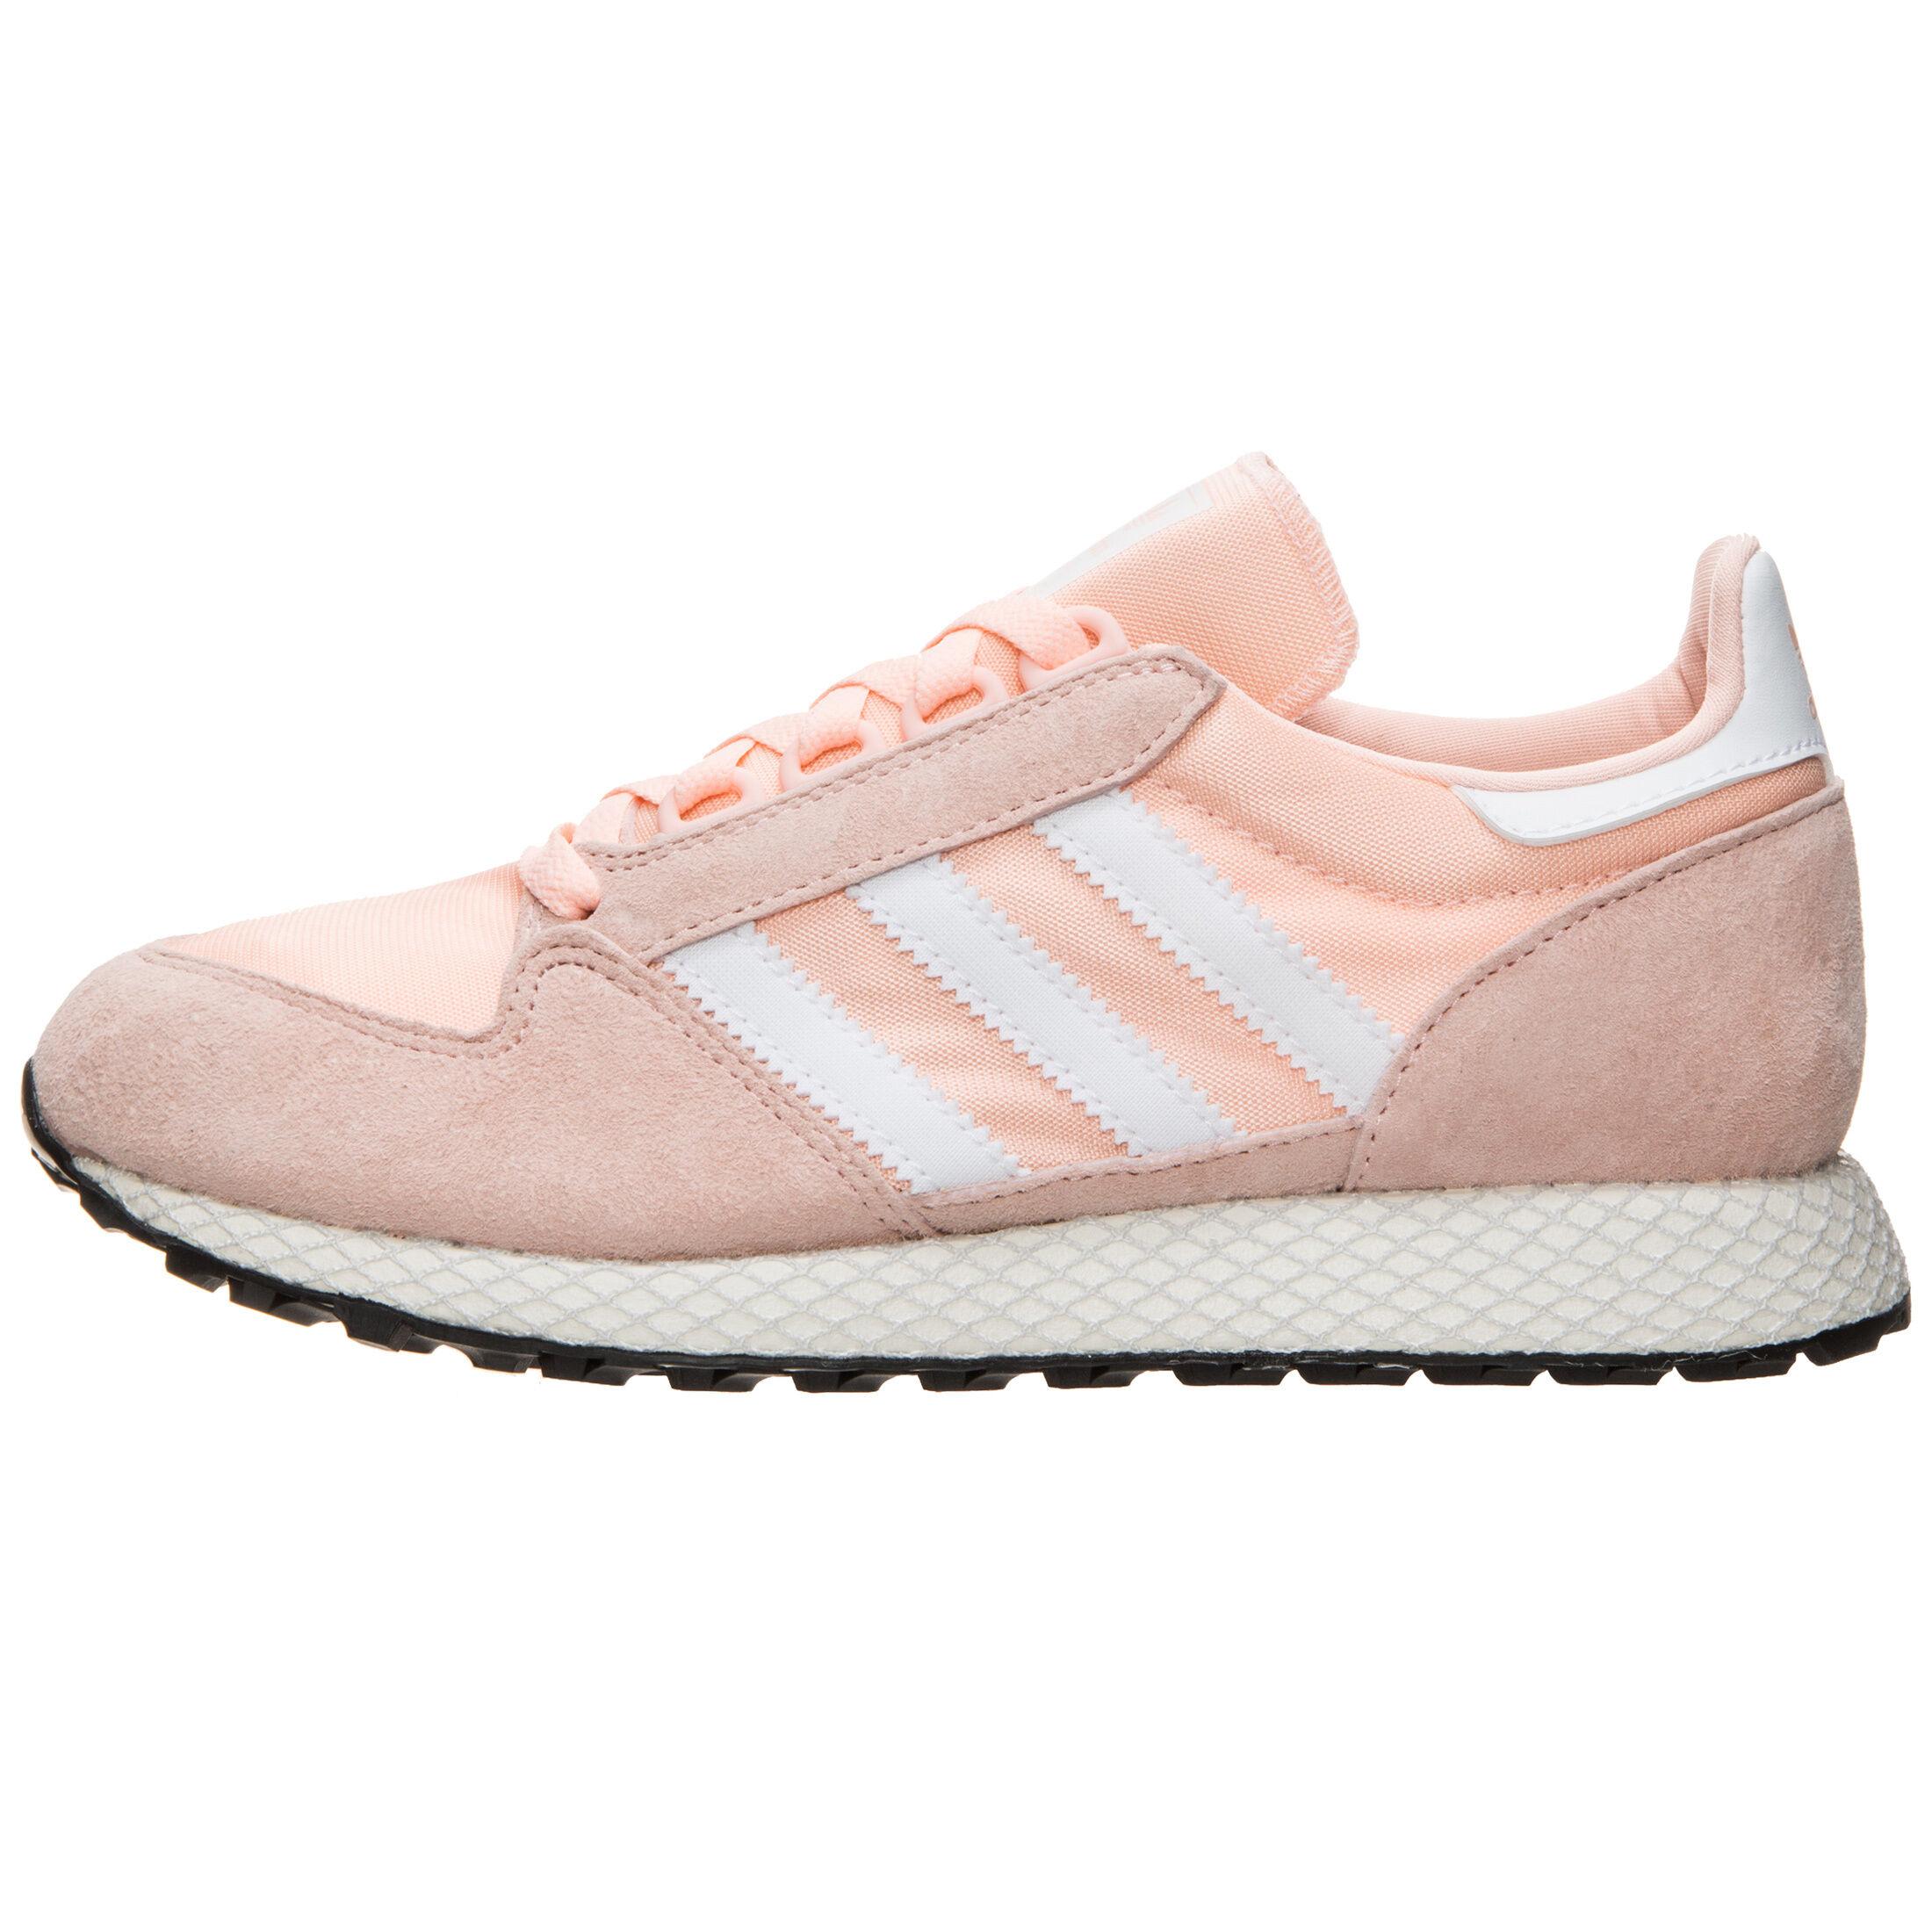 Details zu Adidas Originals SL72 W Sneaker Damen Schuhe Trainers Retro NEU altrosa Gr 38